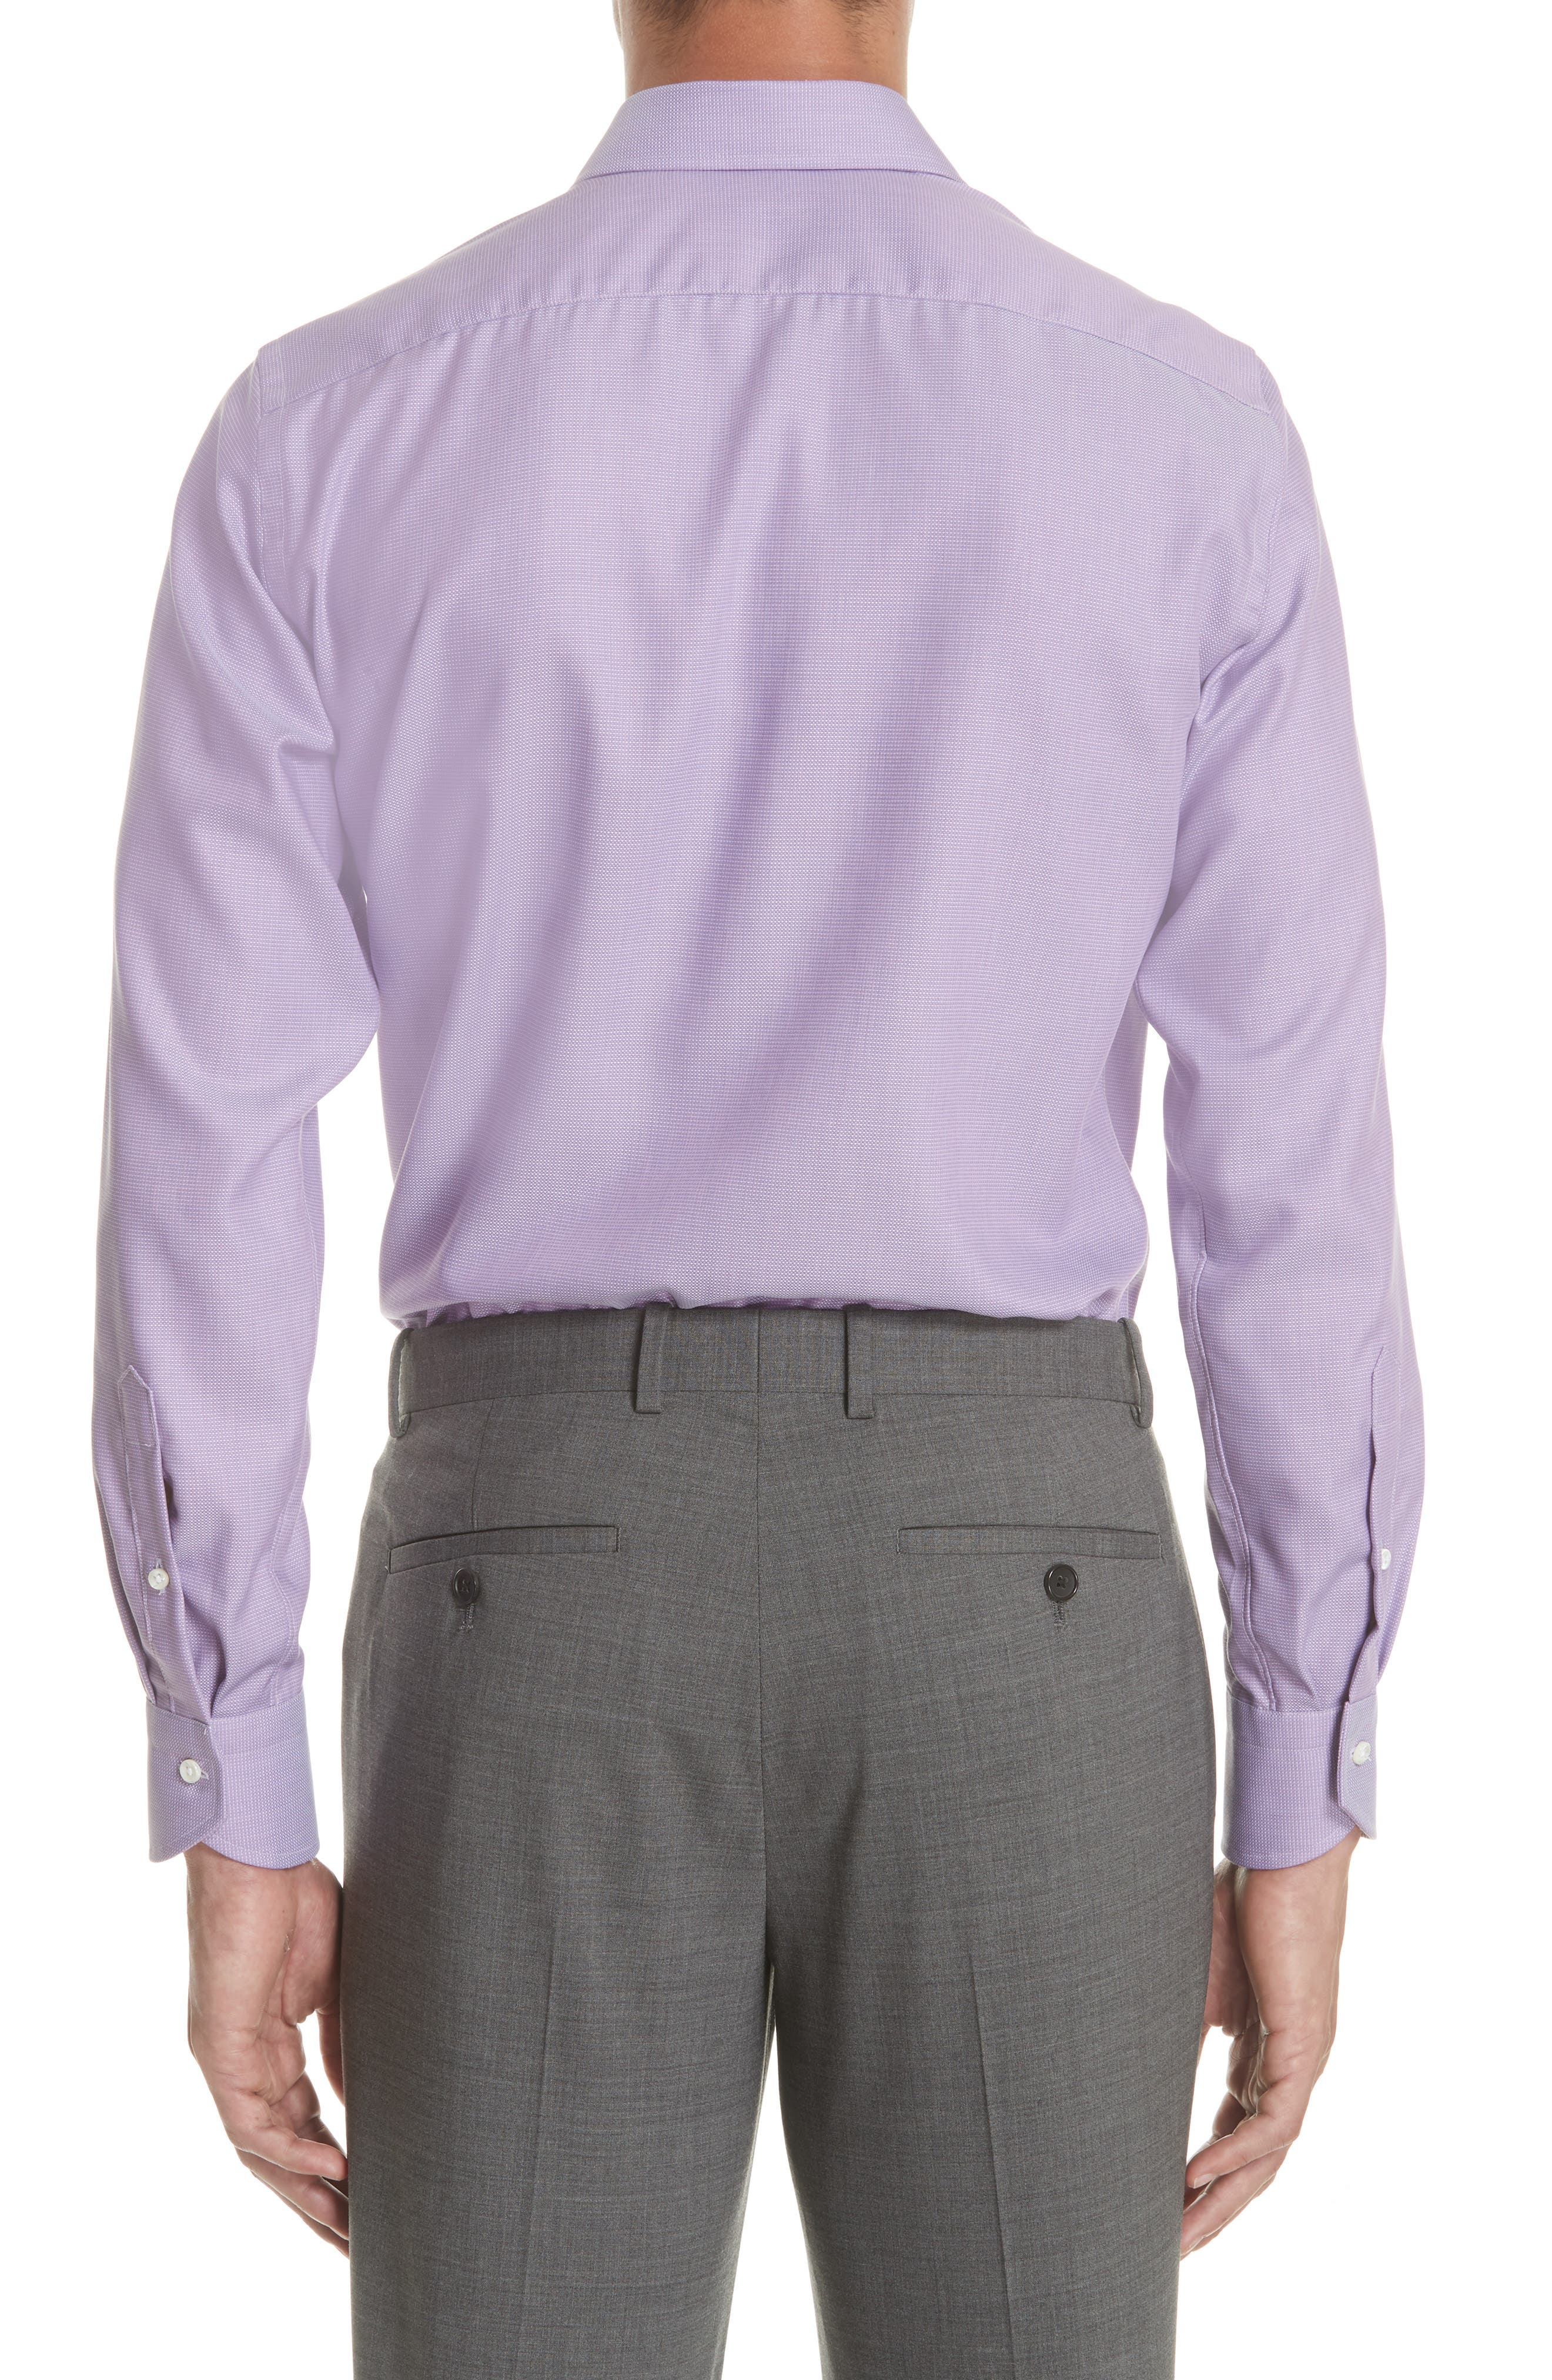 Regular Fit Solid Dress Shirt,                             Alternate thumbnail 3, color,                             520